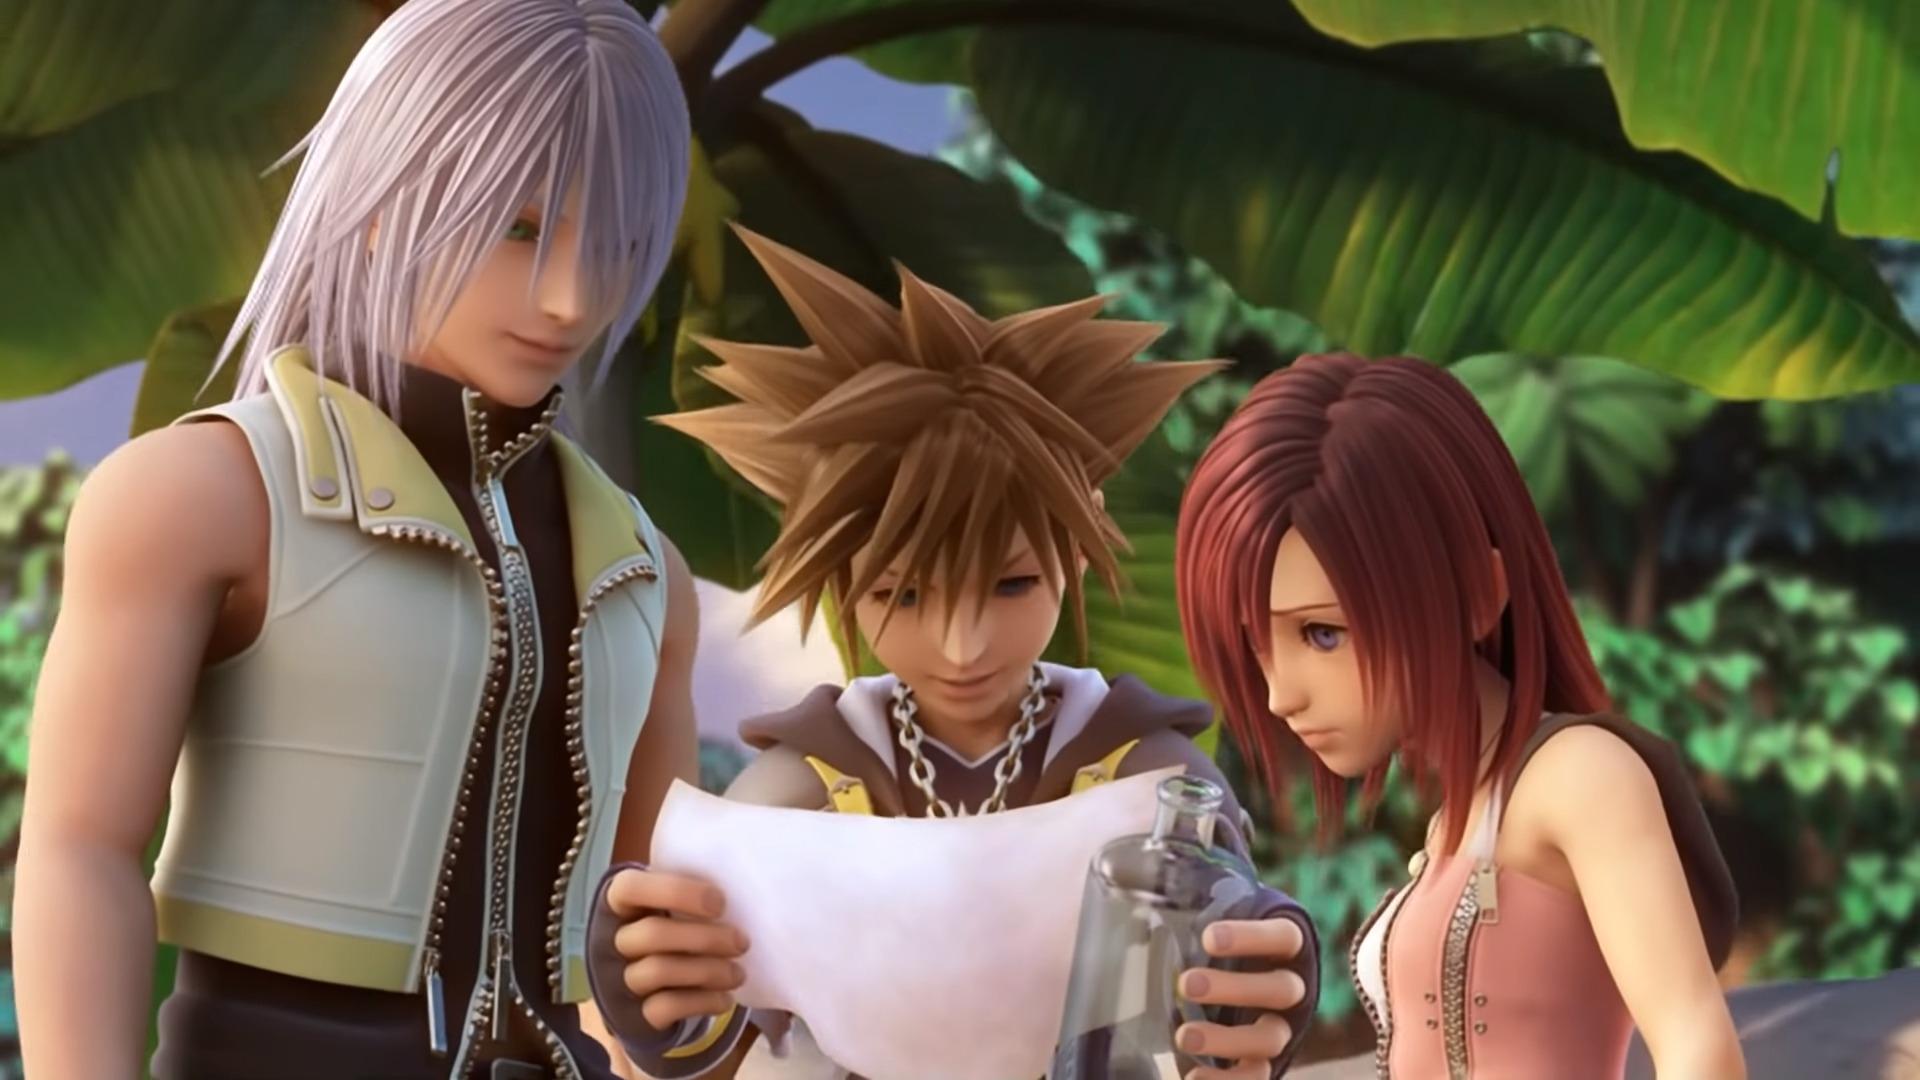 Sora, Riku et Kairi lisant la lettre du roi